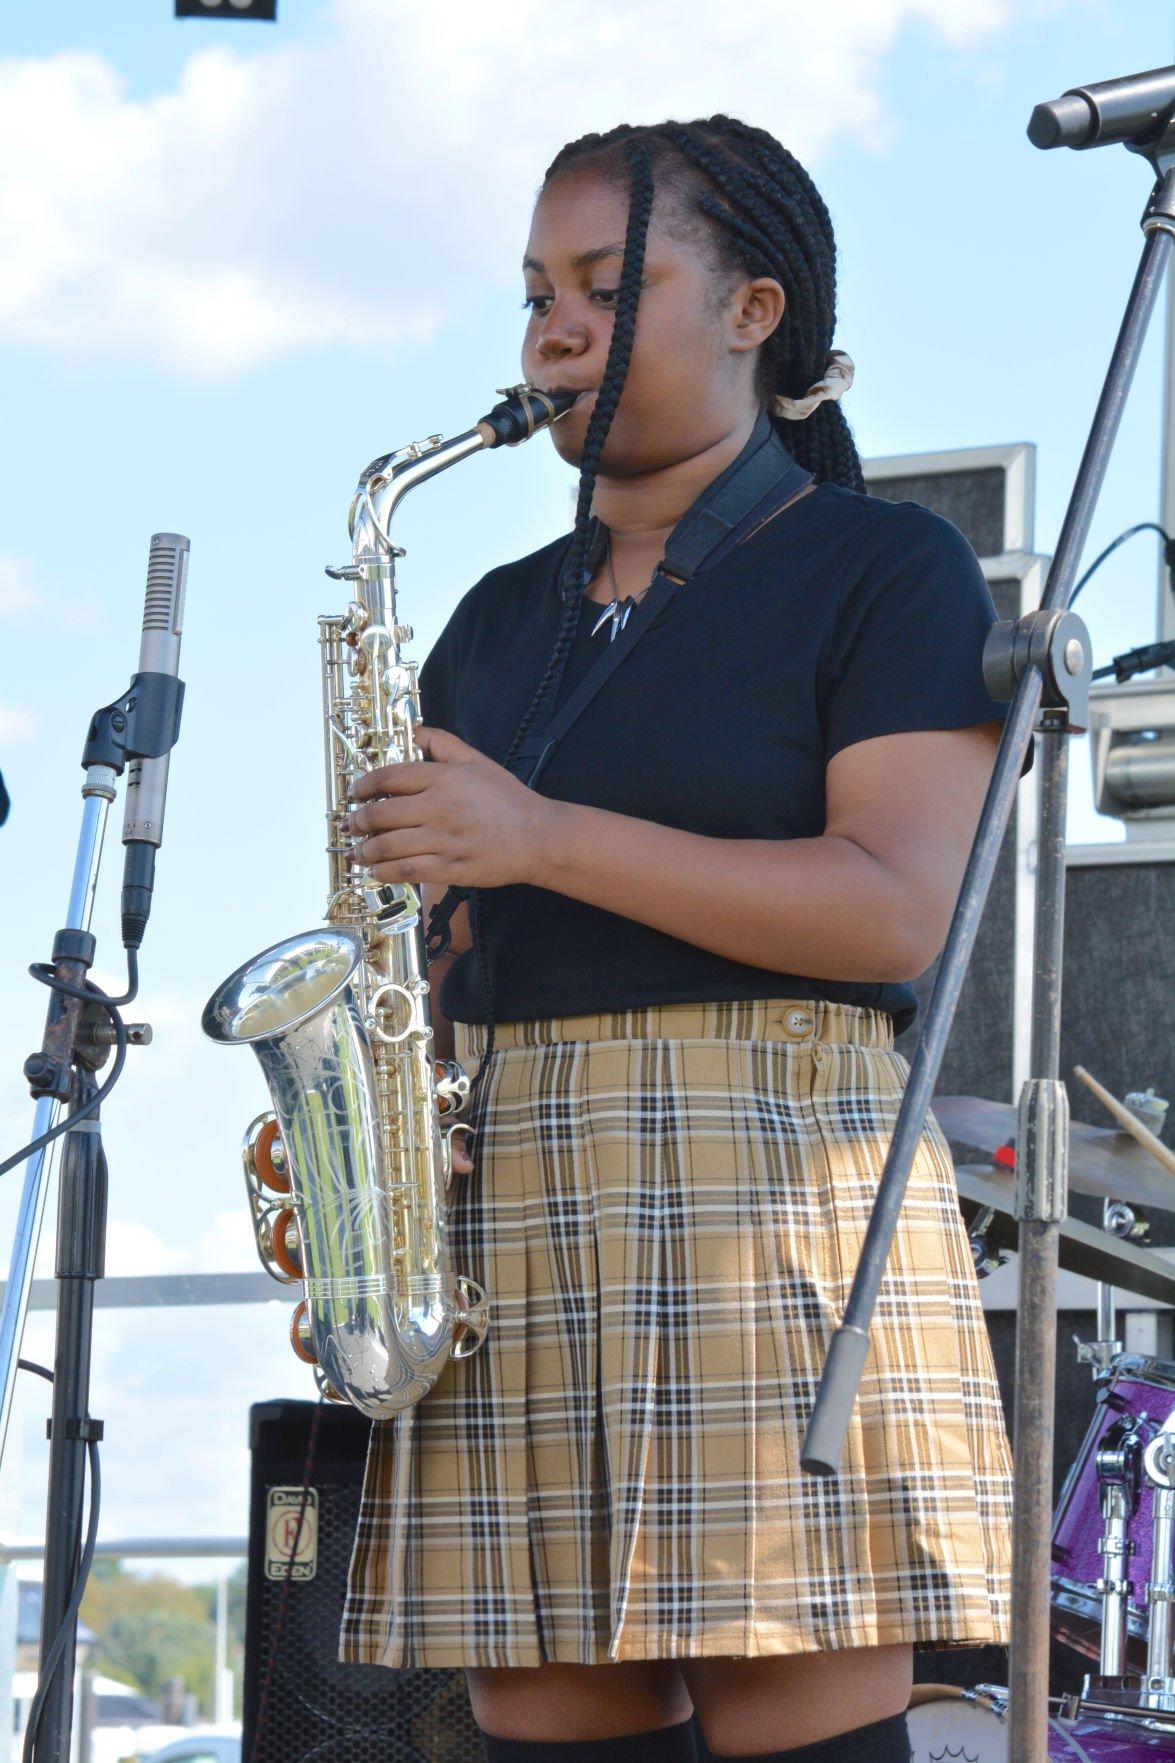 Camera Roll: 25th annual Chestertown Jazz Festival